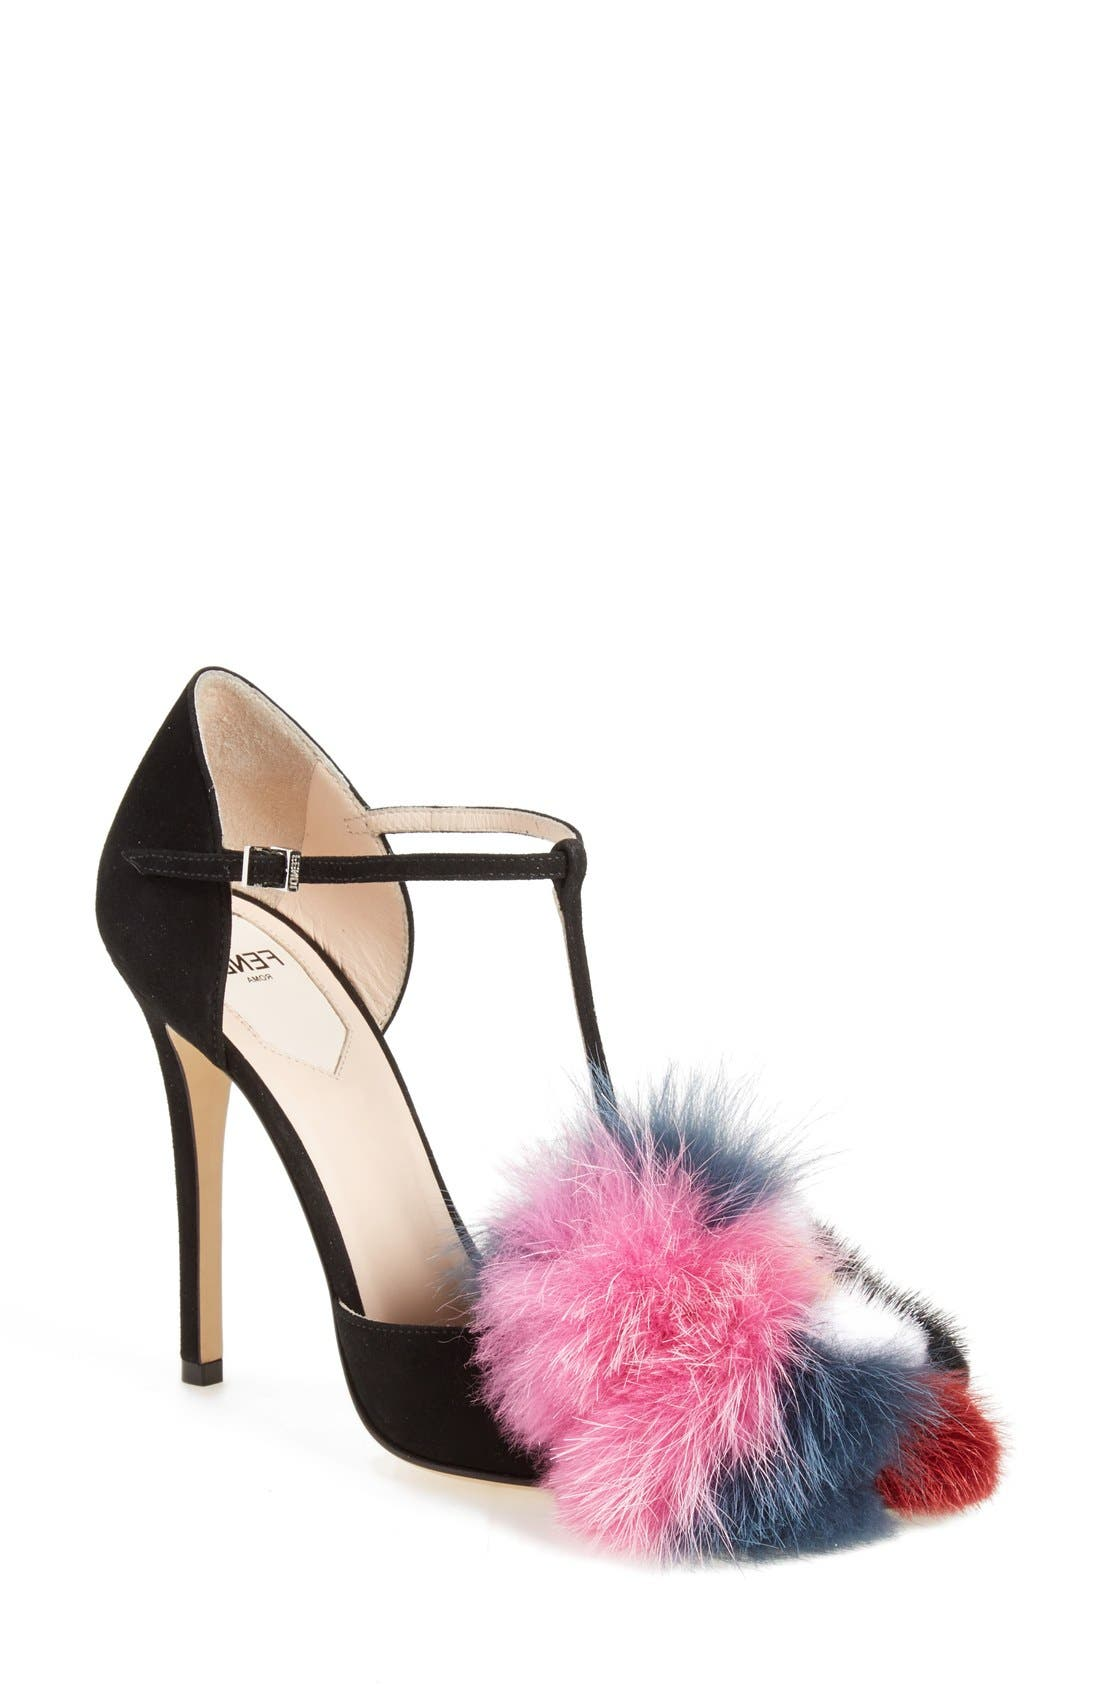 Alternate Image 1 Selected - Fendi 'Flowerland' Genuine Mink & Fux Fur Trim Sandal (Women)